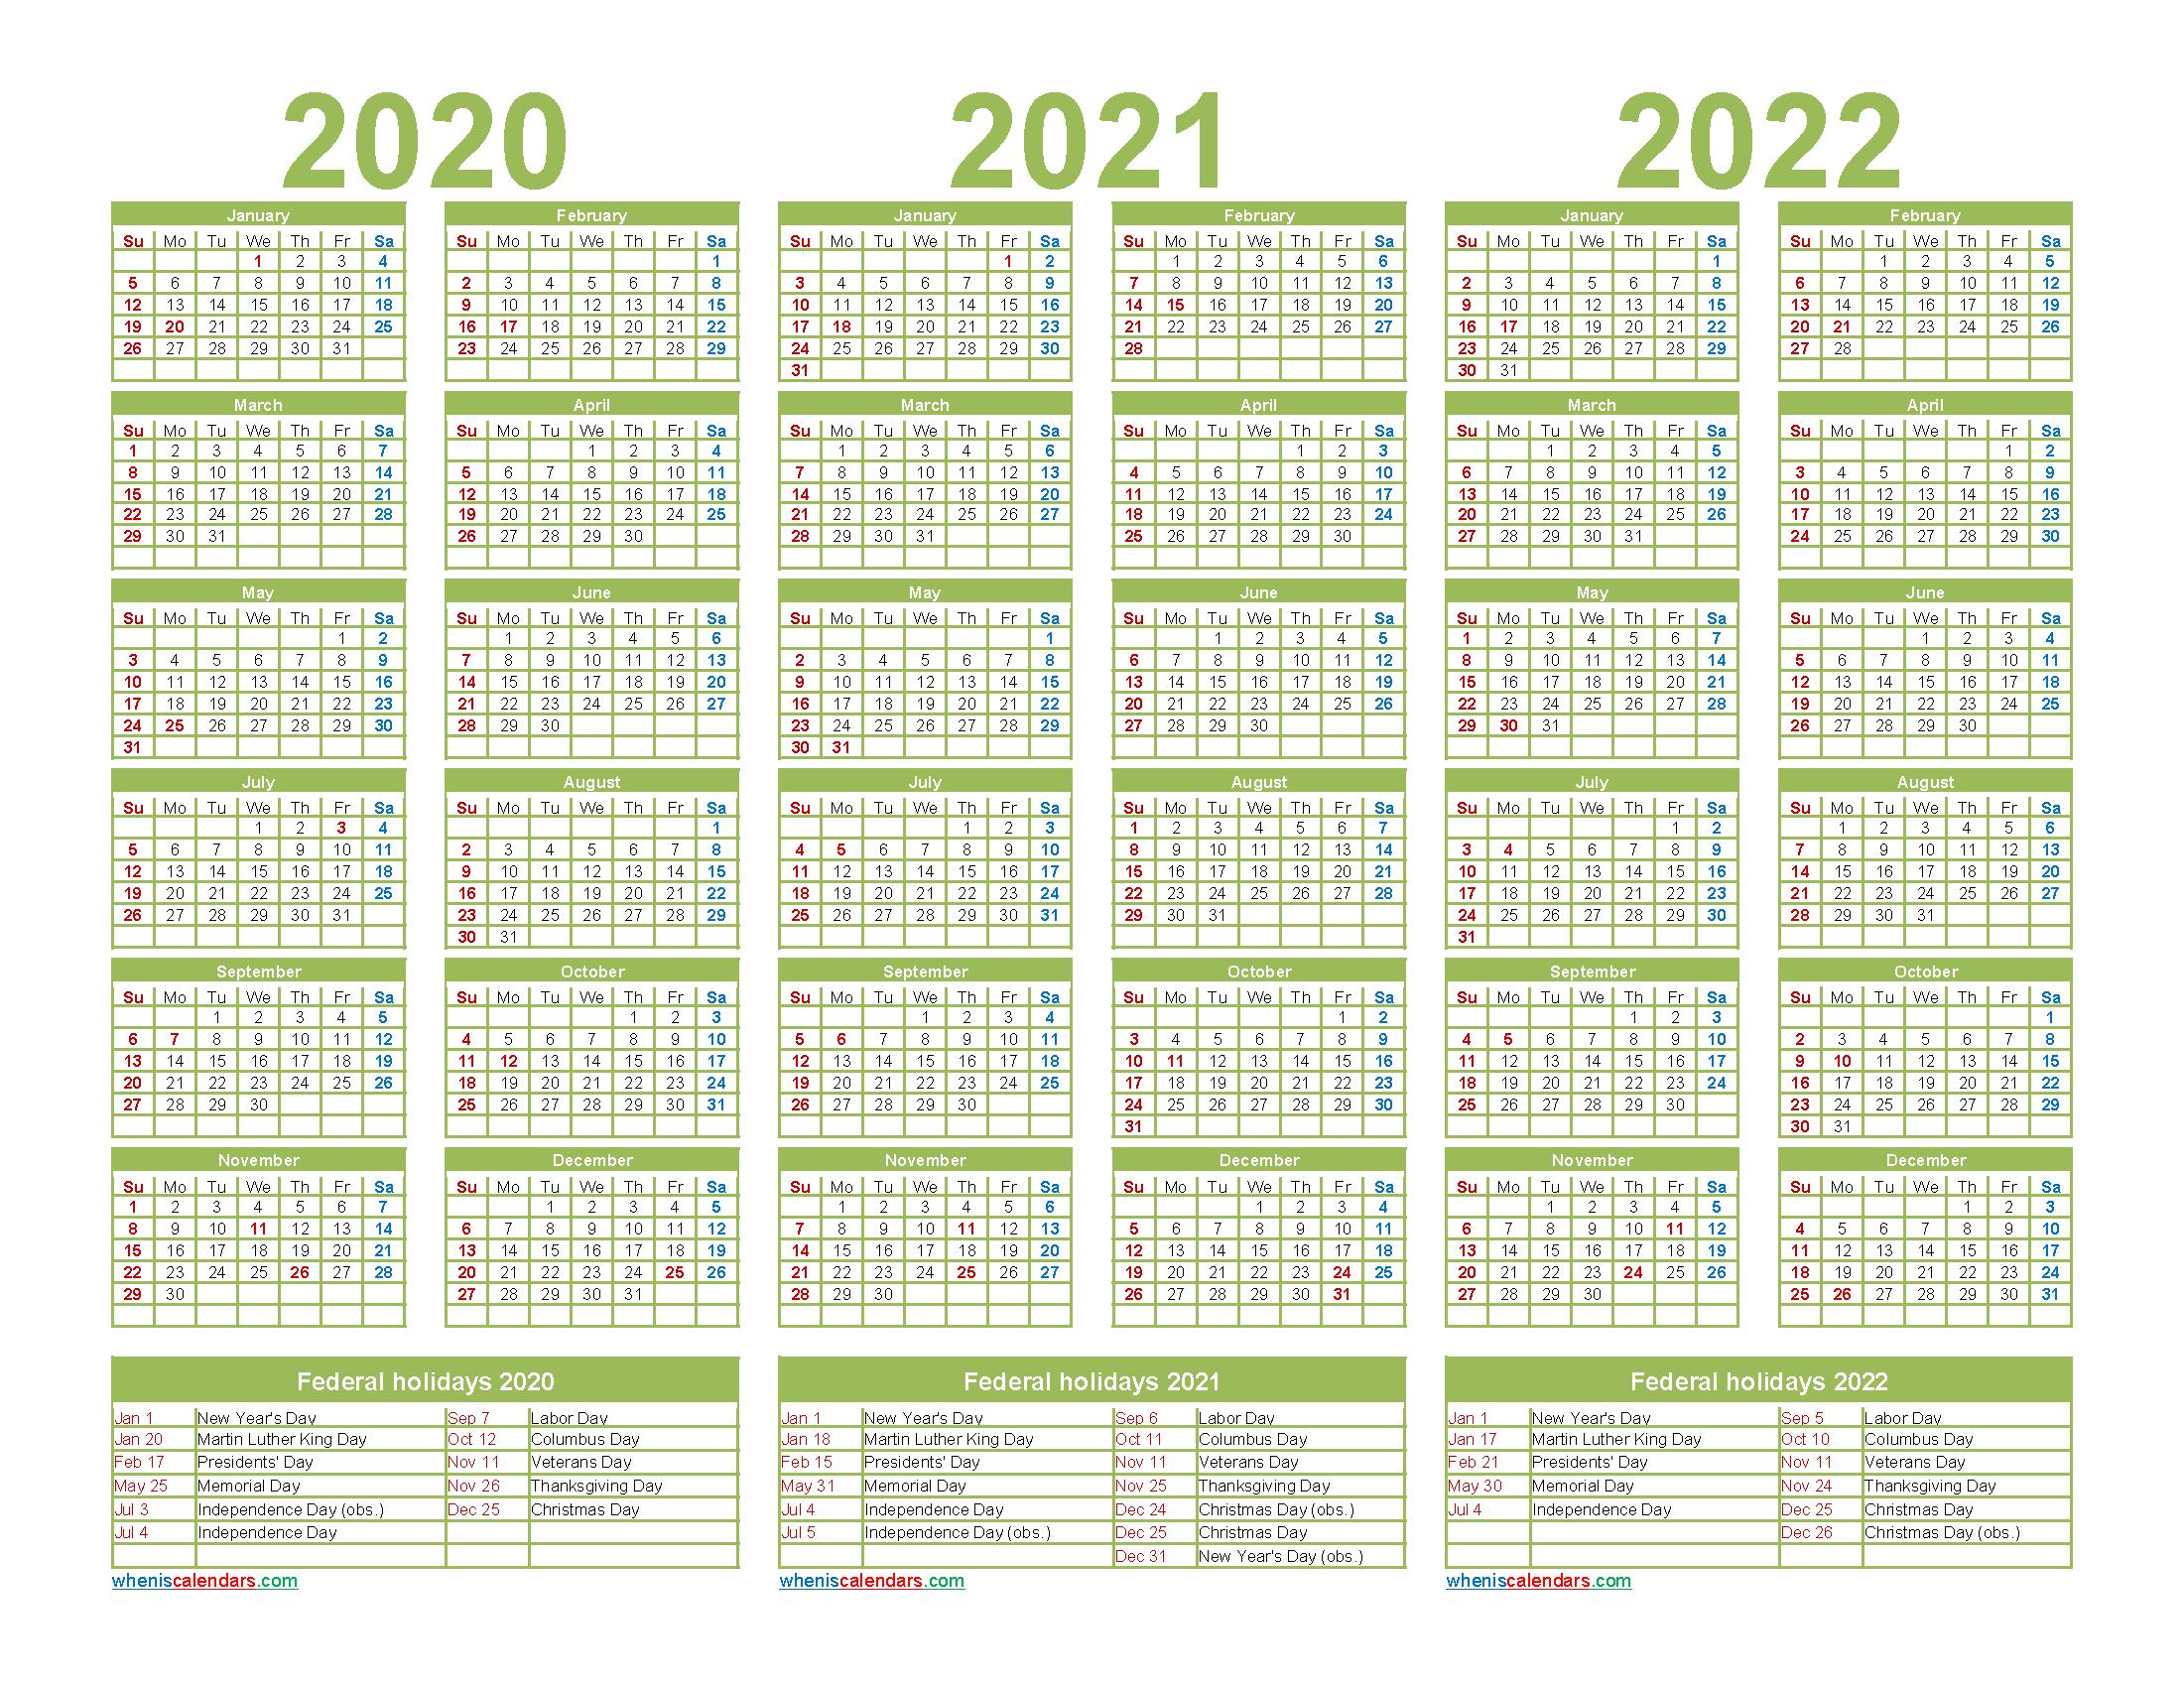 Calendar Creator 2022.2020 Calendar 2021 Printable With Holidays In 2021 Calendar Calendar Creator Free Lettering